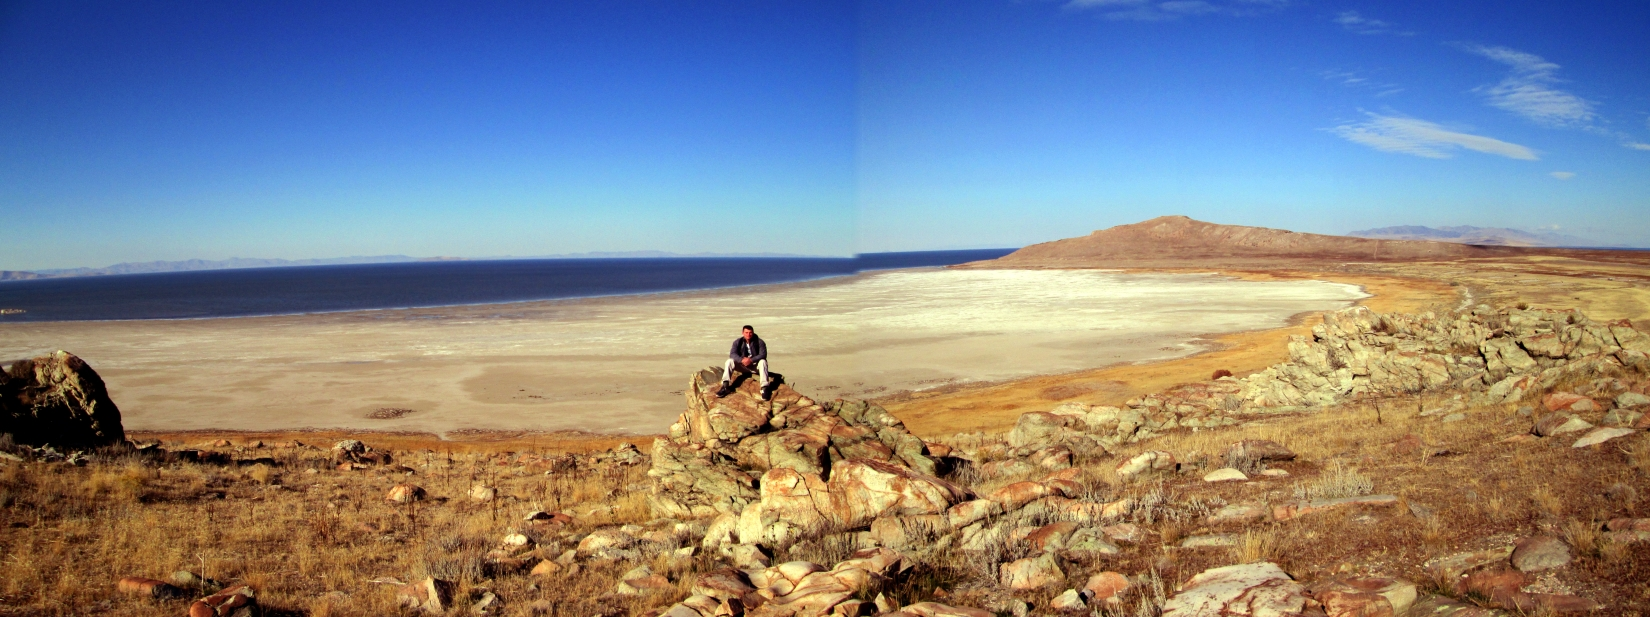 Justin, rocks, salt, and the Great Salt Lake